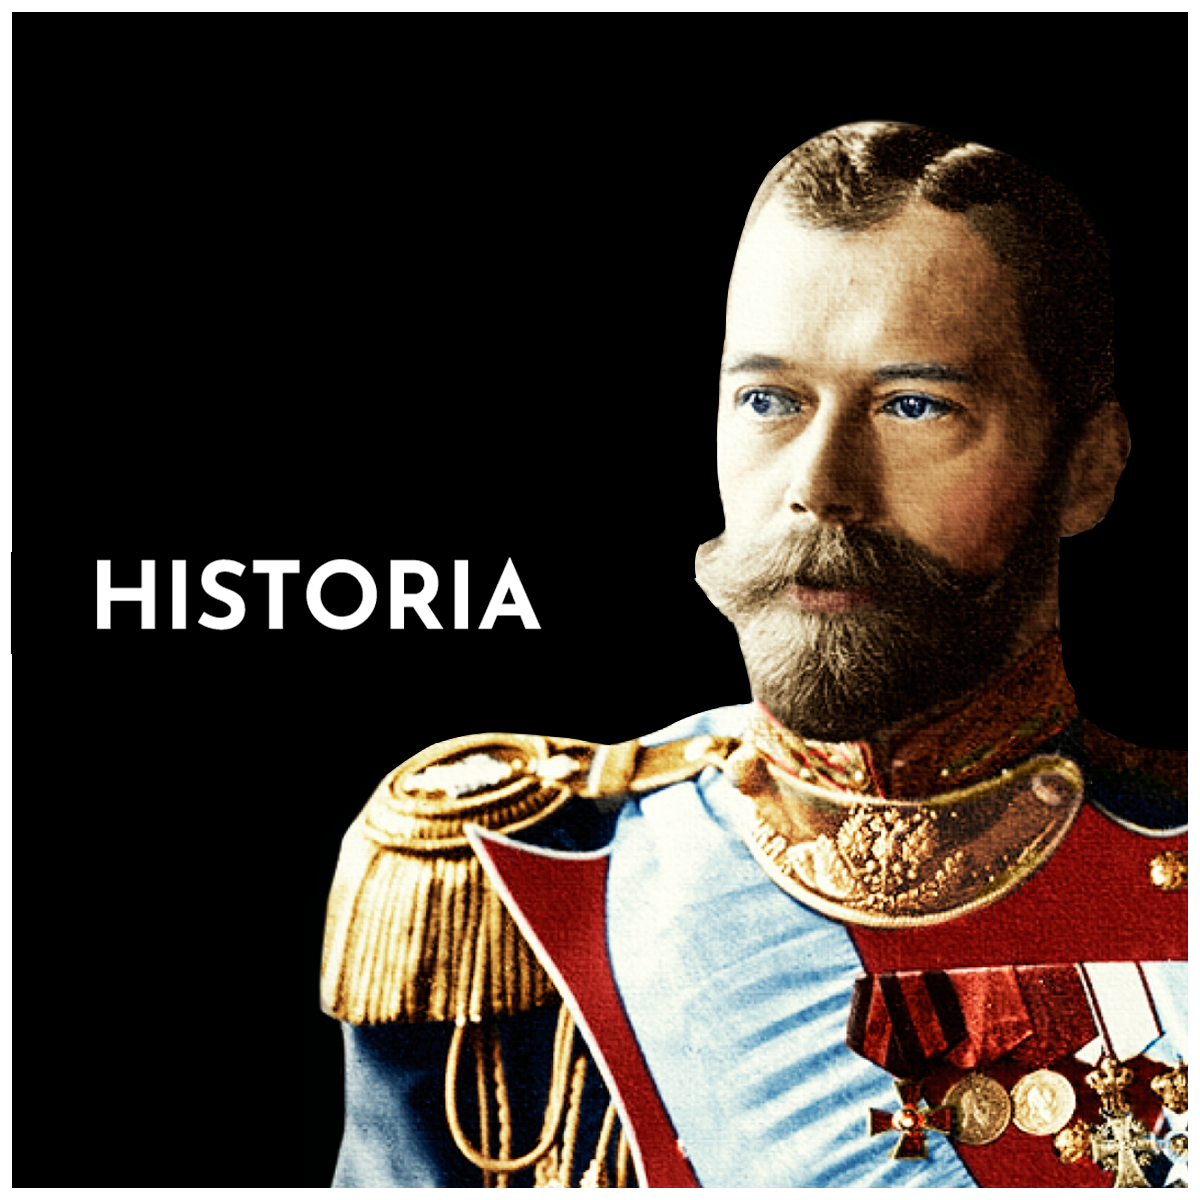 Cursos de Historia, Cursos de historia en español, Cursos Online, cursos en español, aprendizaje, cursos en linea, Ilustre, cursos gratis